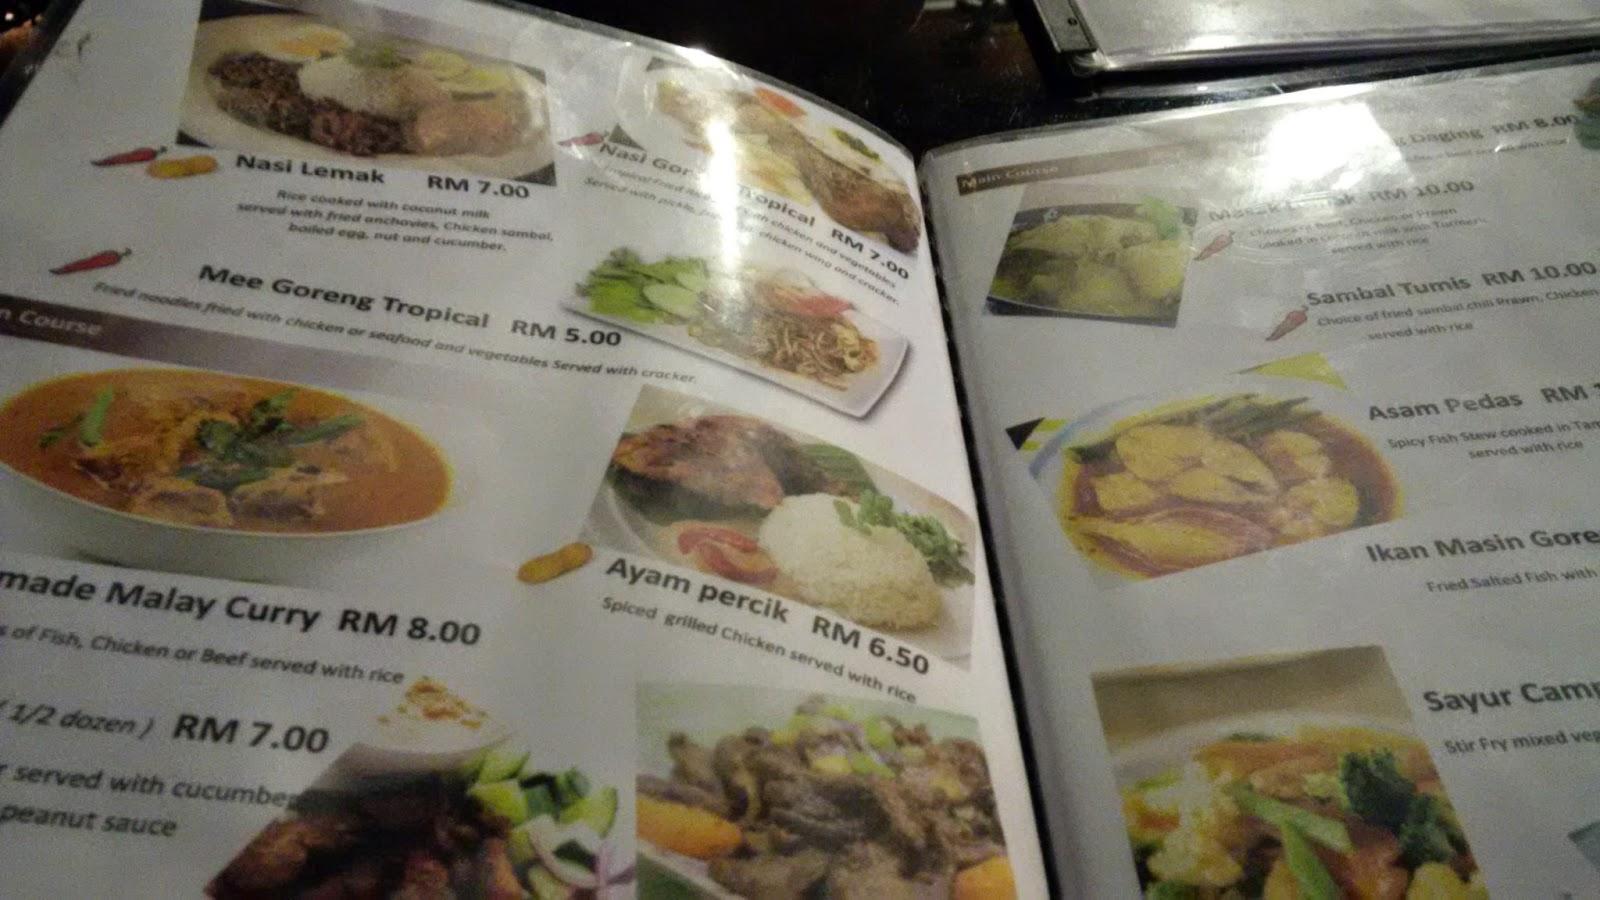 food, langkawi restaurants, melayu malay cuisine restaurant langkawi, cheap food langkawi, tasteful malaysian dishes, nasi lemak, curry, ikan masin langkawi, travel,